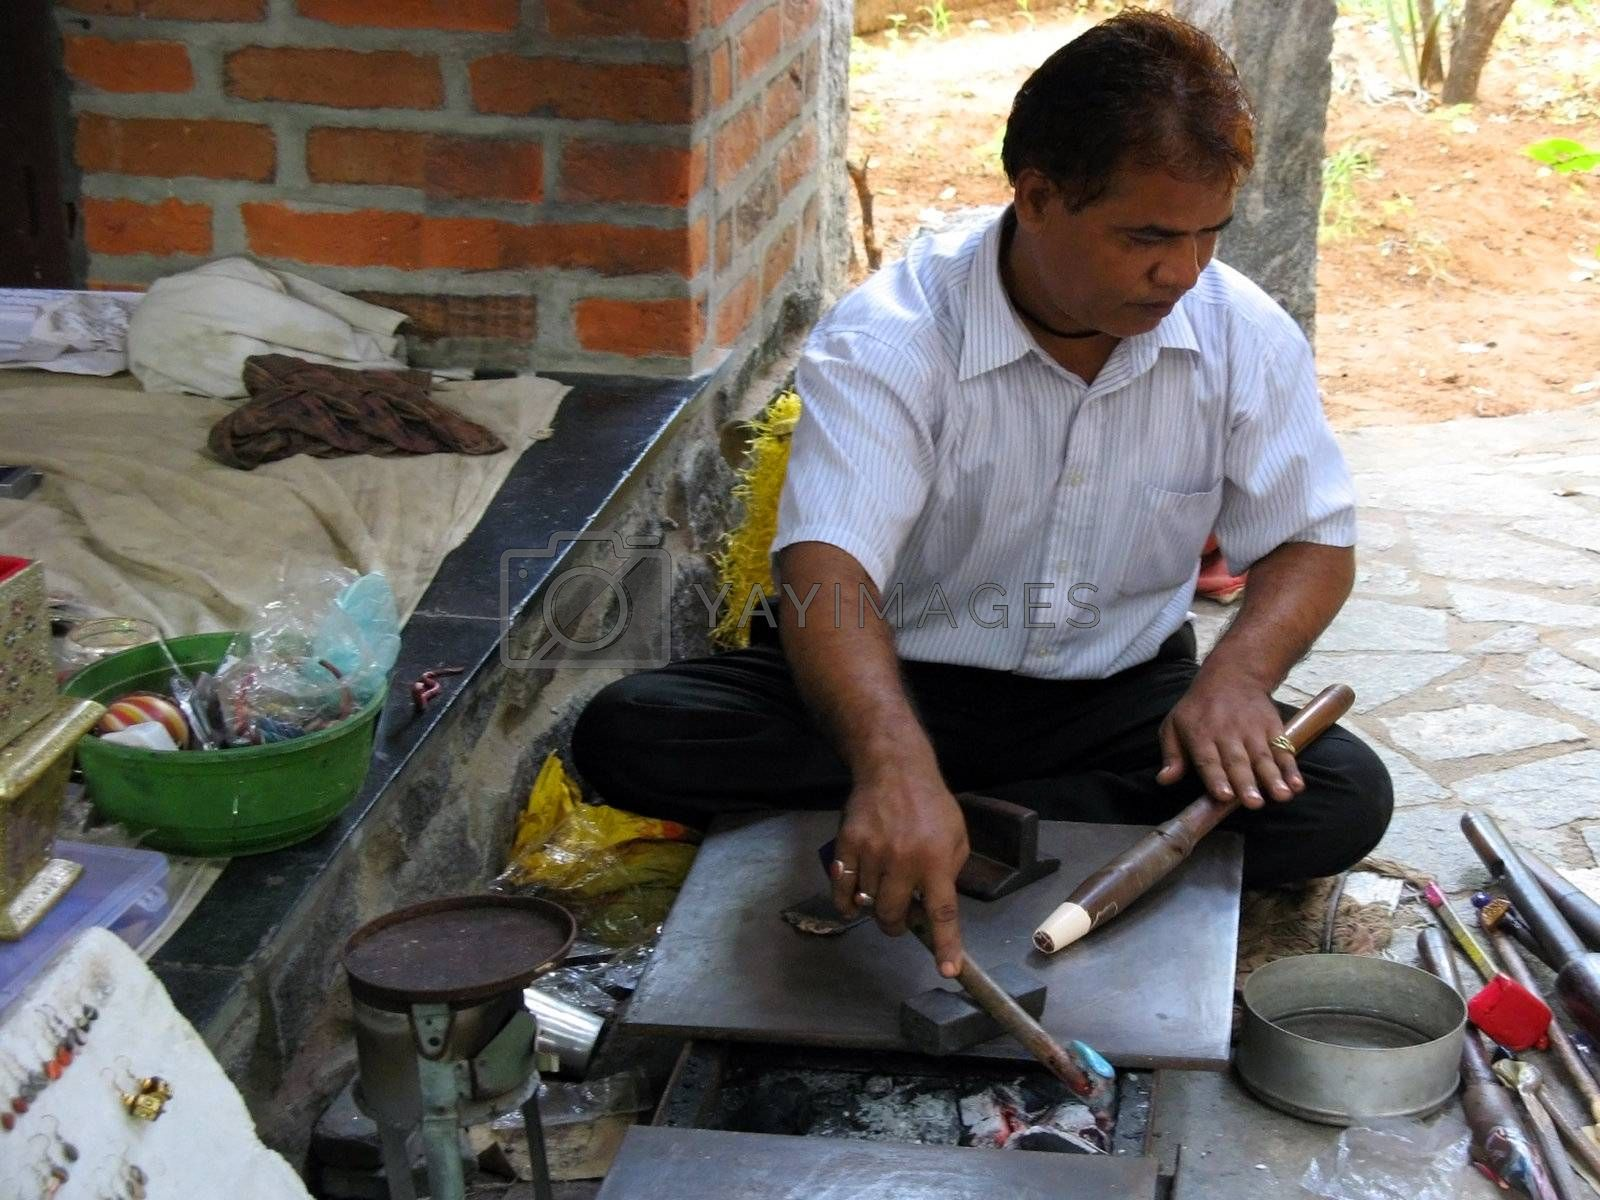 An artist in India creates jewelry.